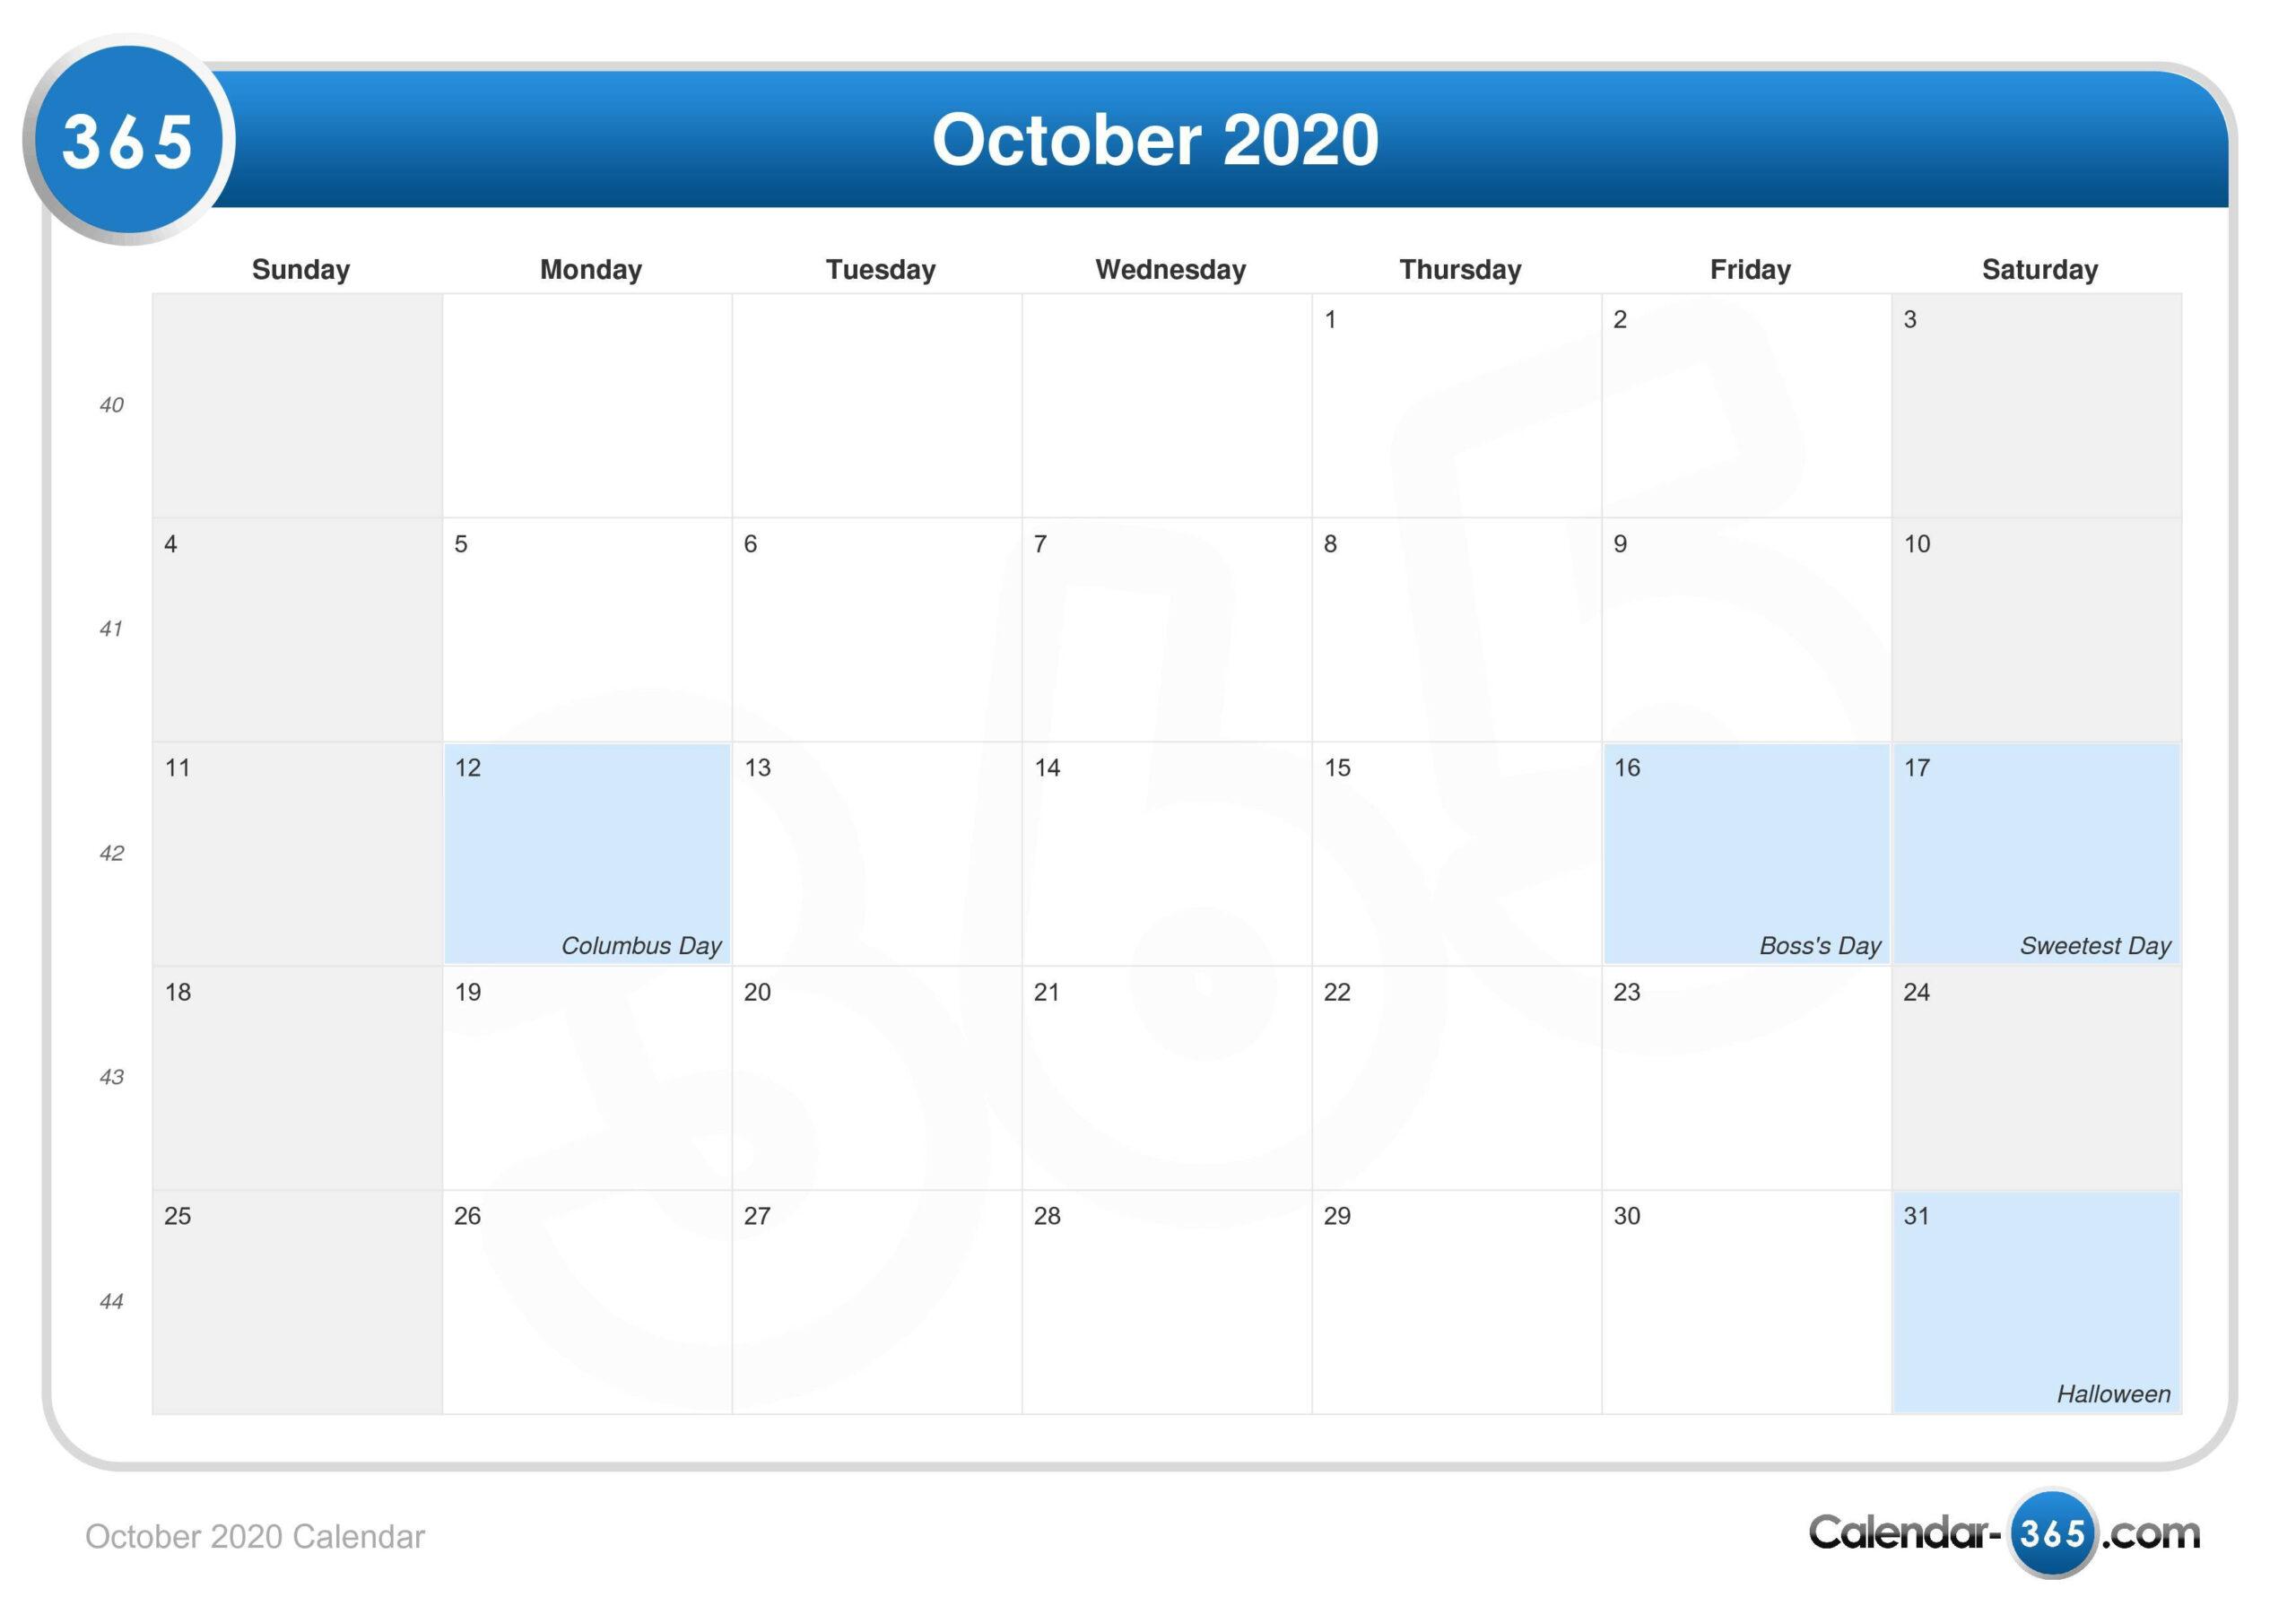 October 2020 Calendar regarding Bring Up A Calendar For October